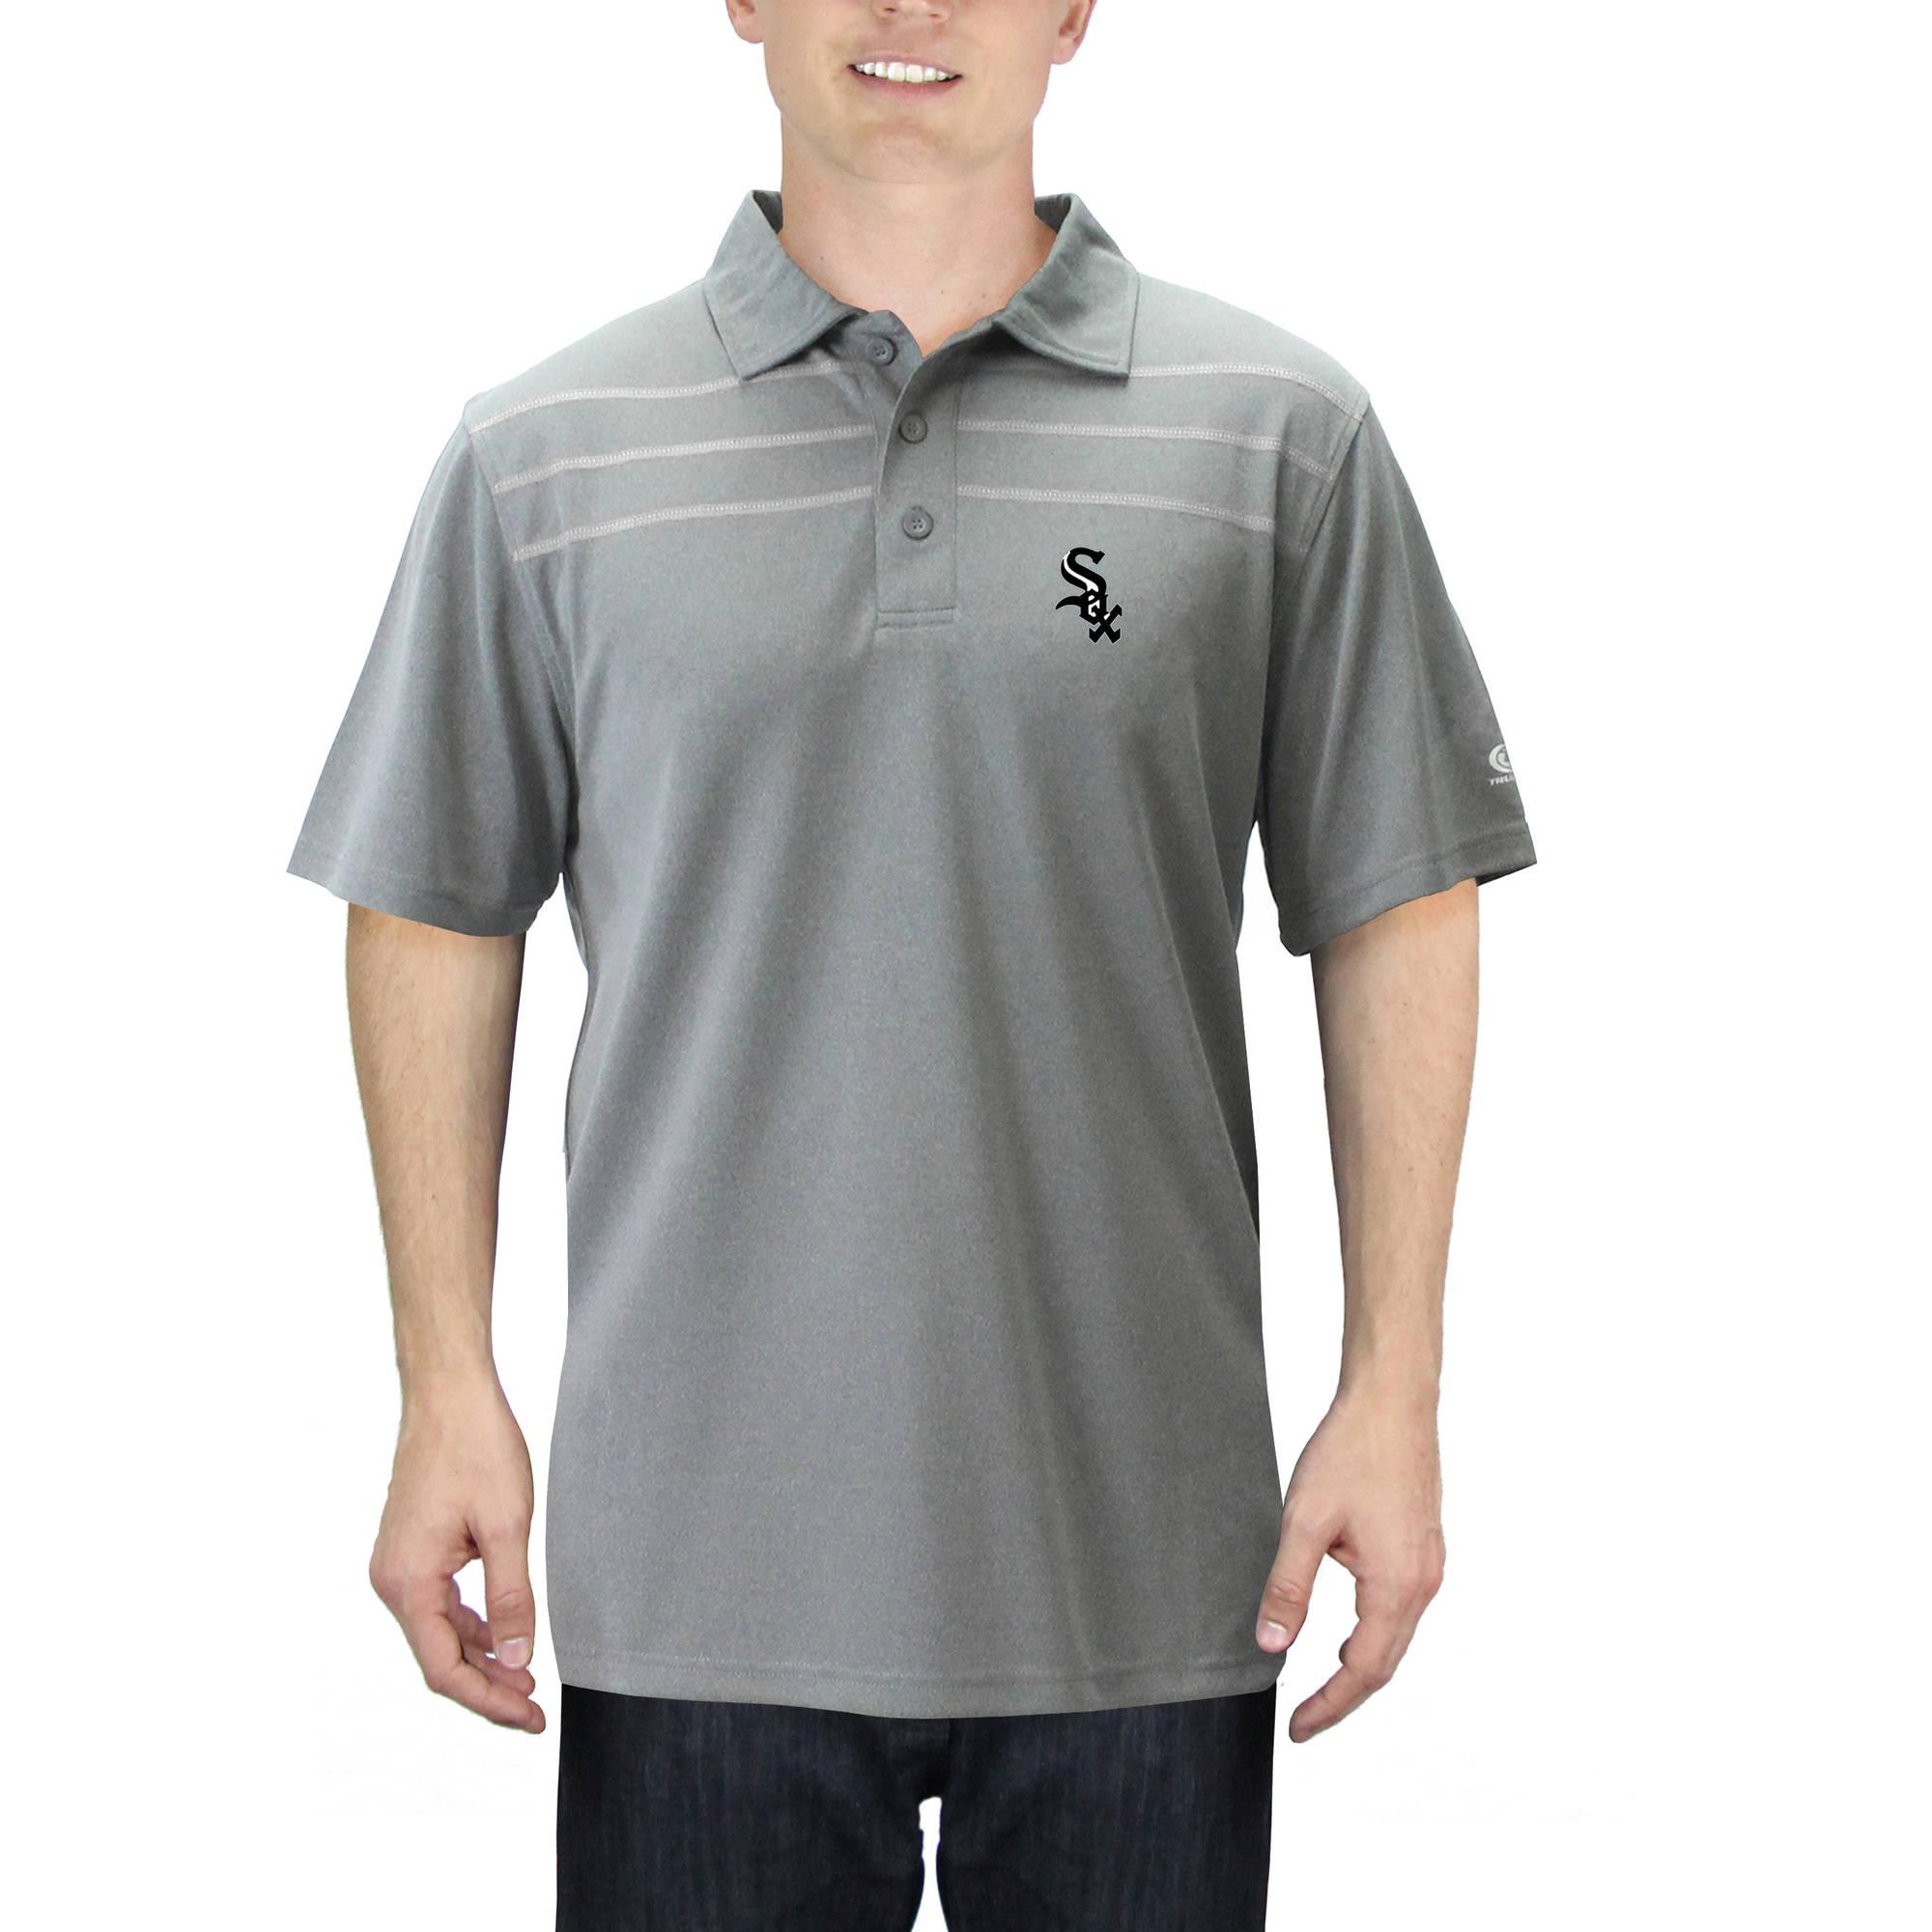 MLB Chicago Whitesox Big Men's Mini Pique Short Sleeve Polo, 2XL